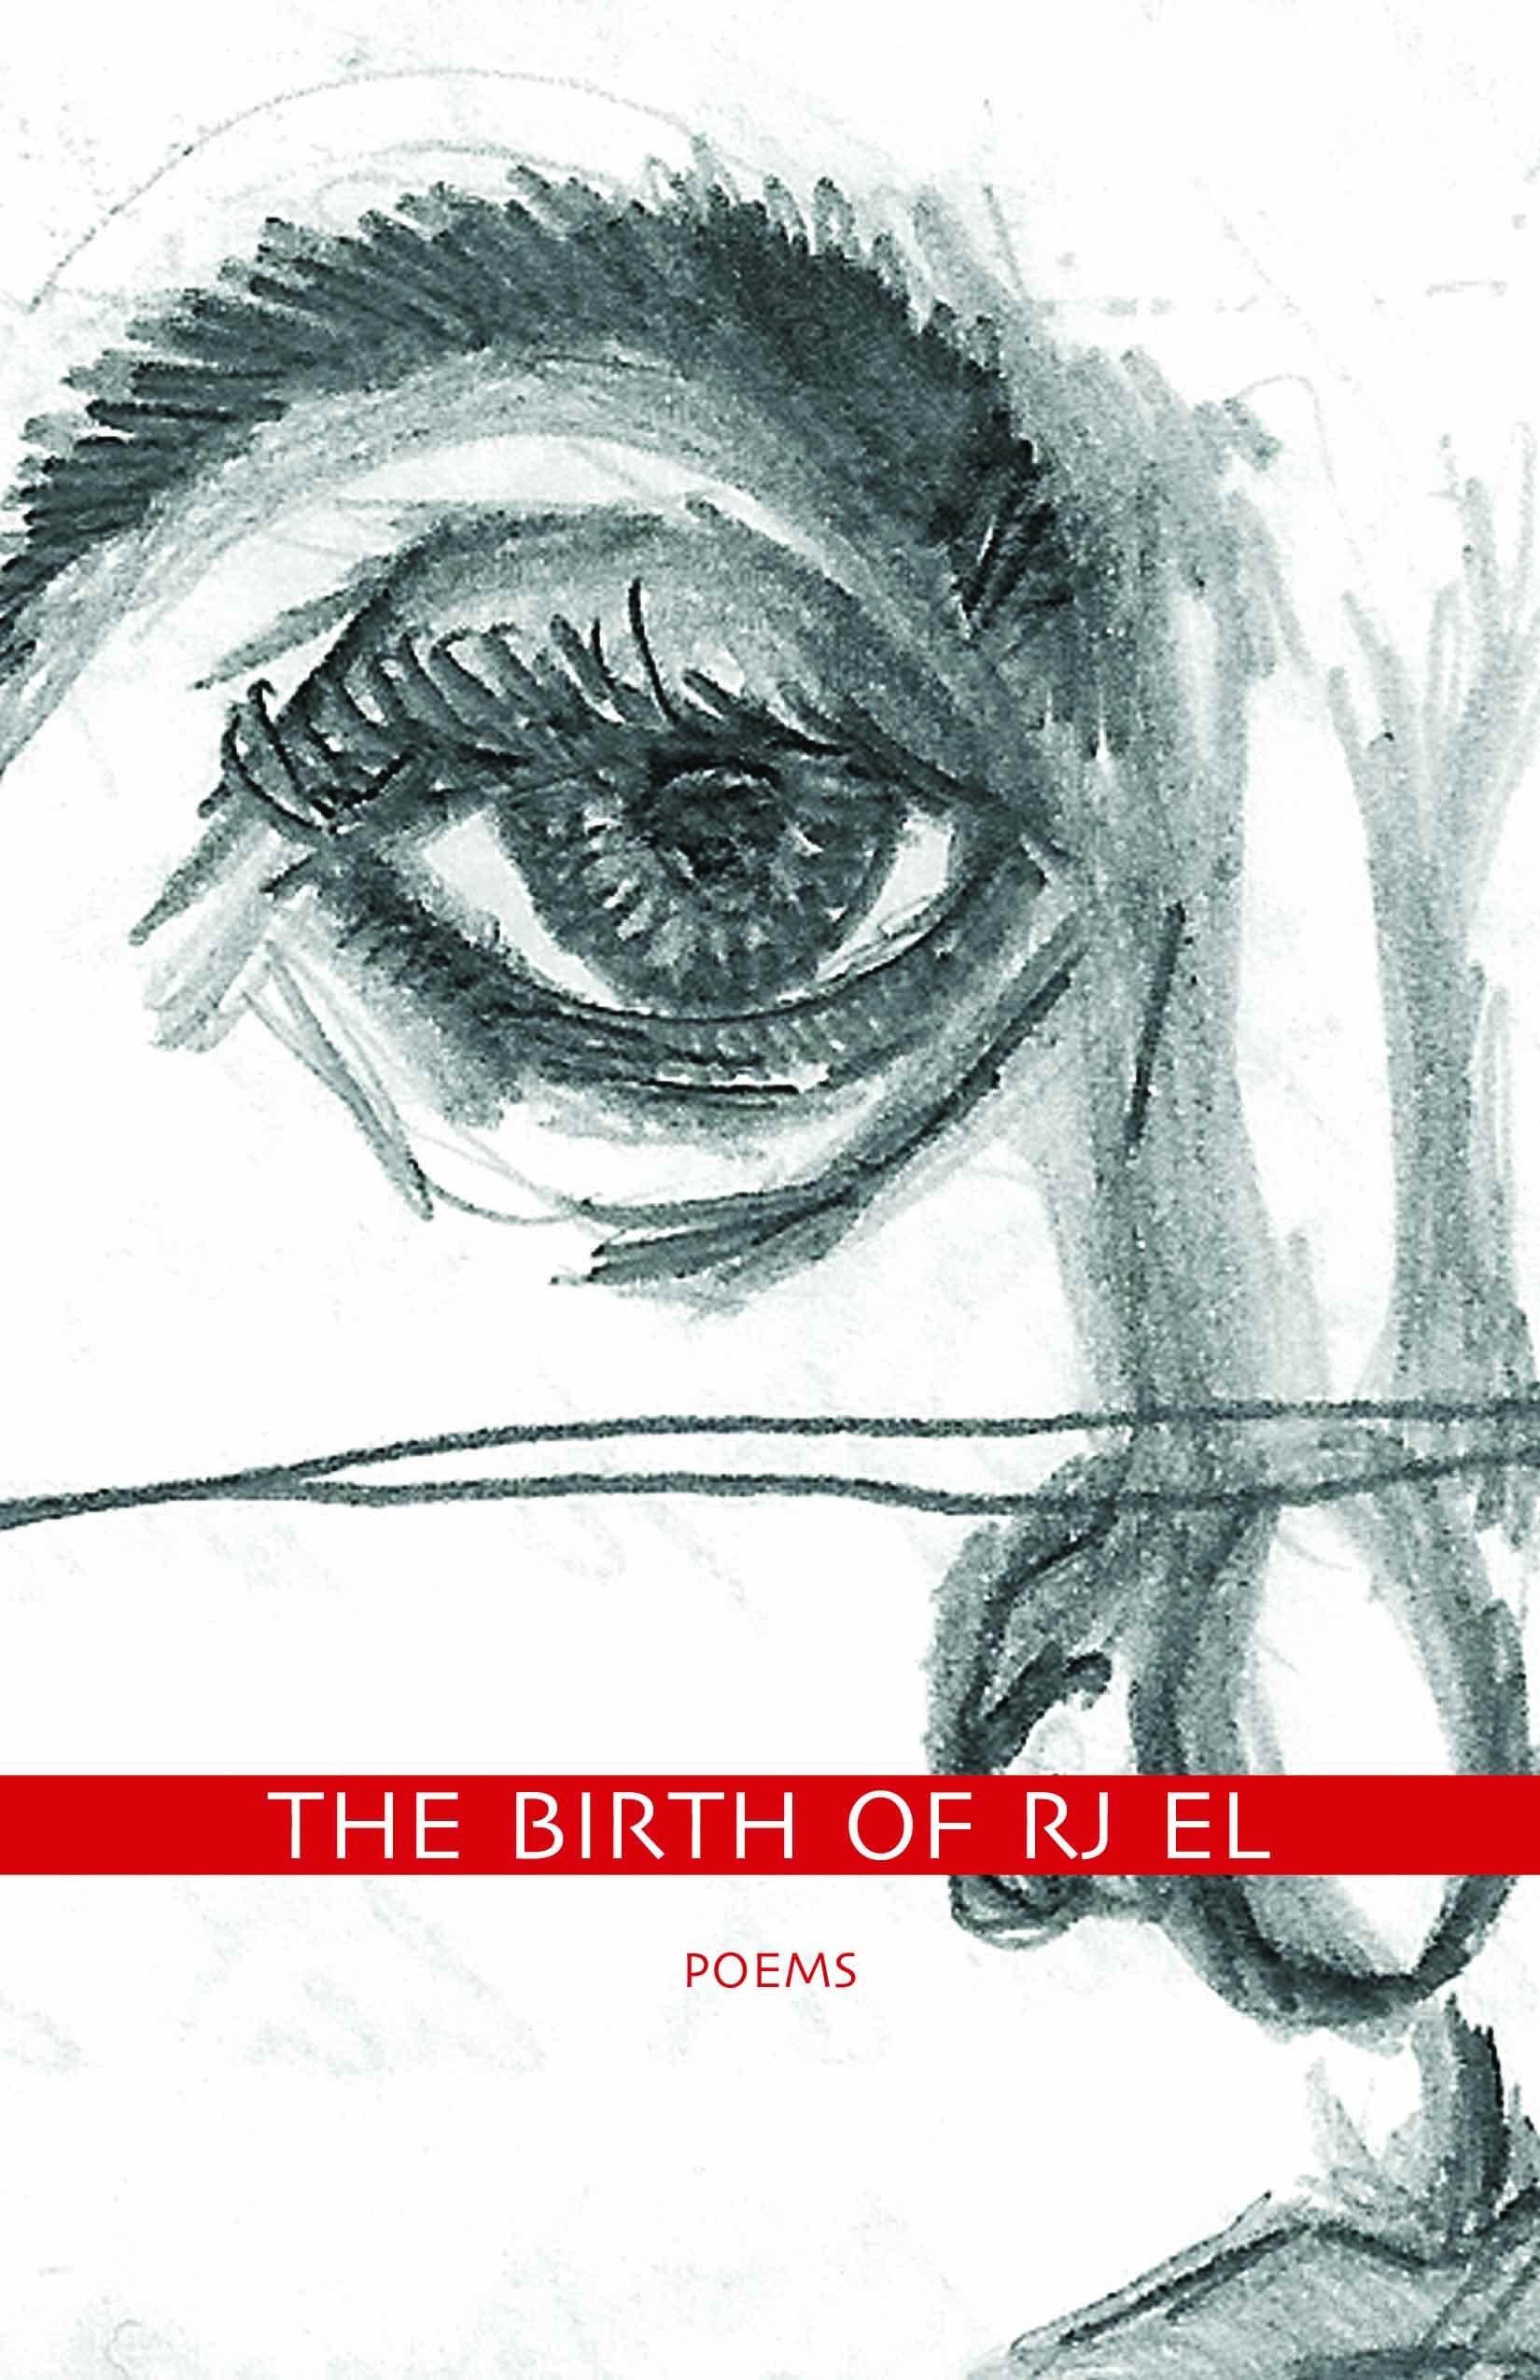 book-cover_small.jpg